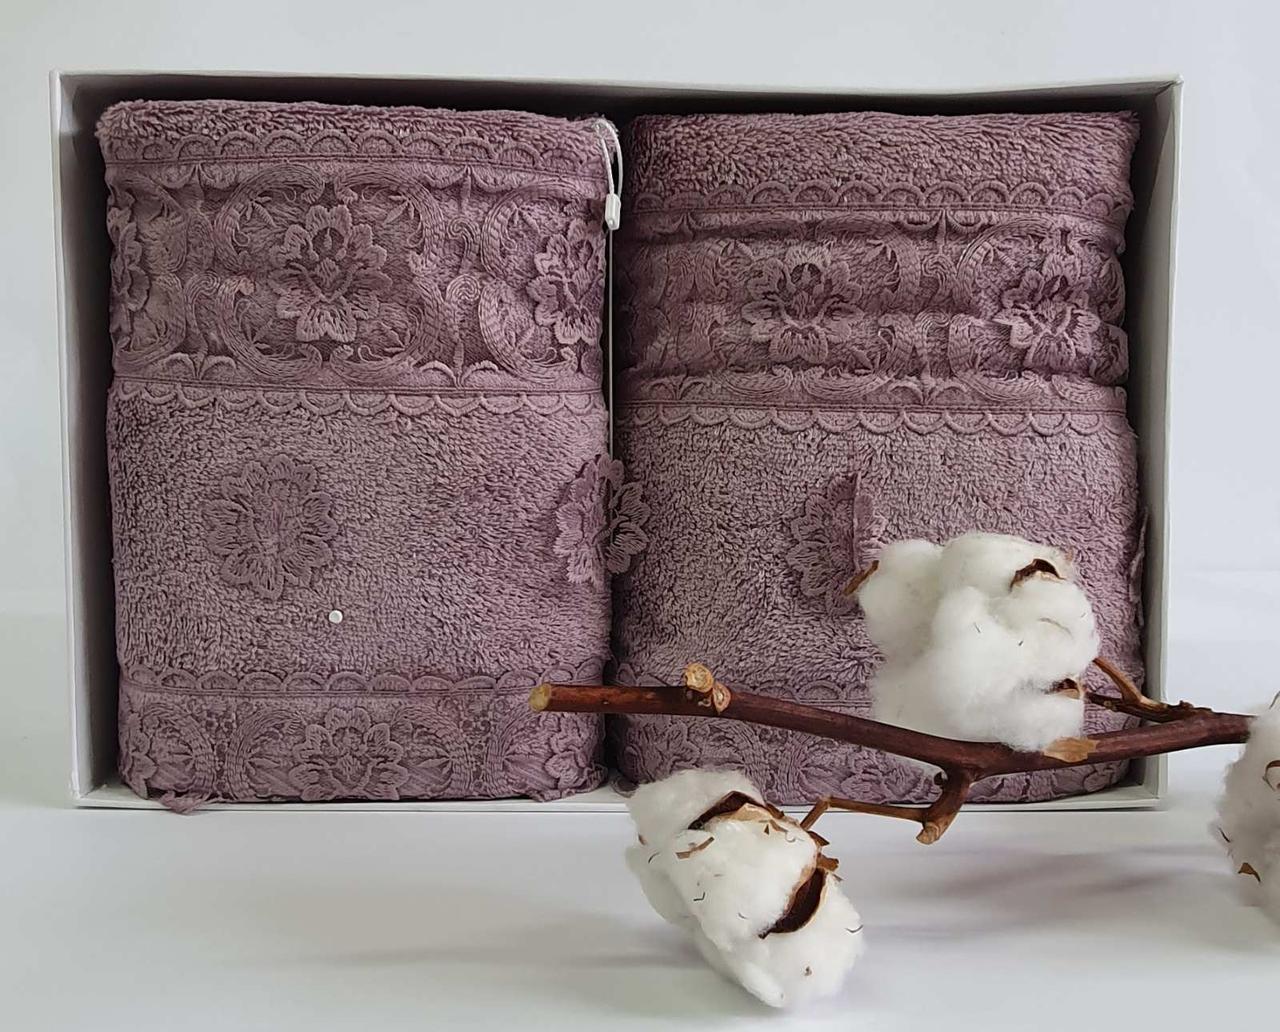 Полотенца Maison D'or 2шт Intensive Bamboo Lilac